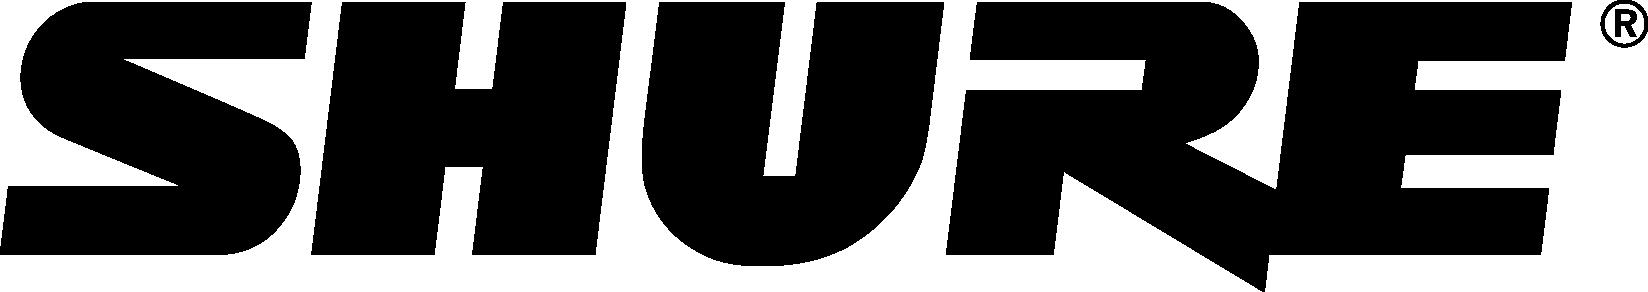 Shure-Logo-without-Tagline_Black